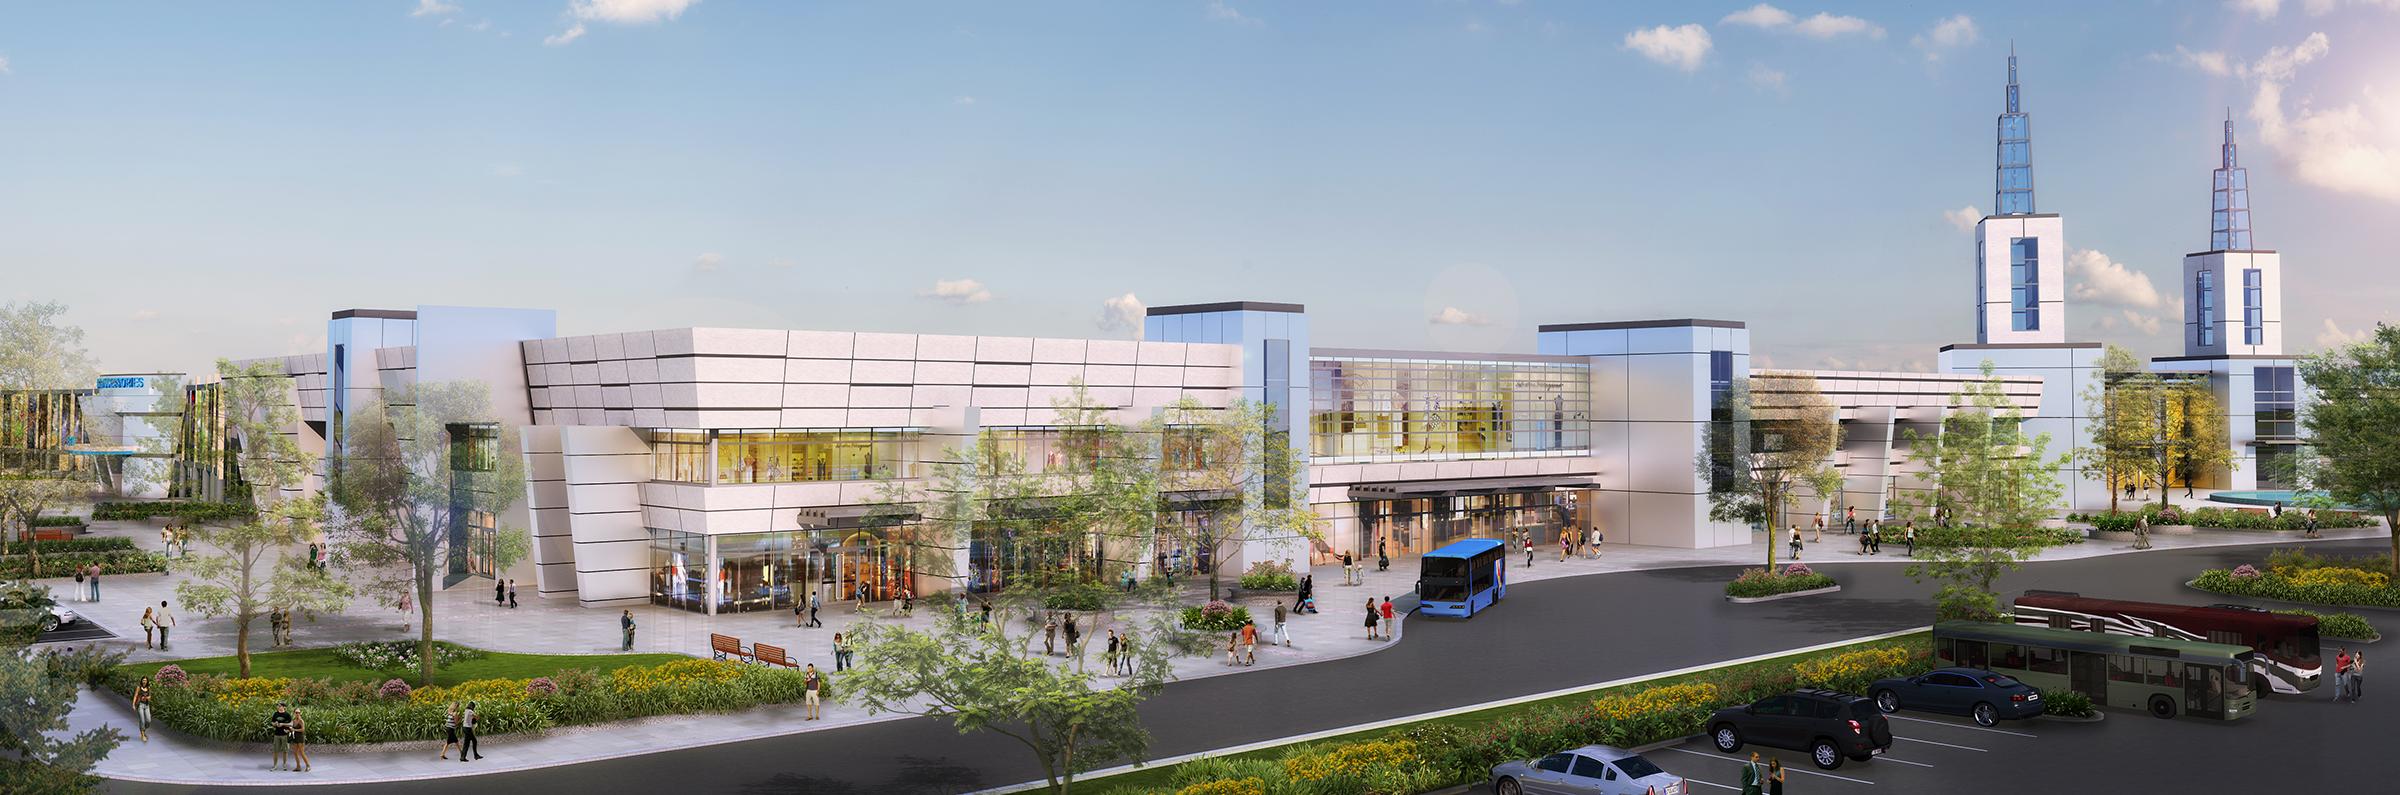 PhoenixMart Business Center and Marketplace